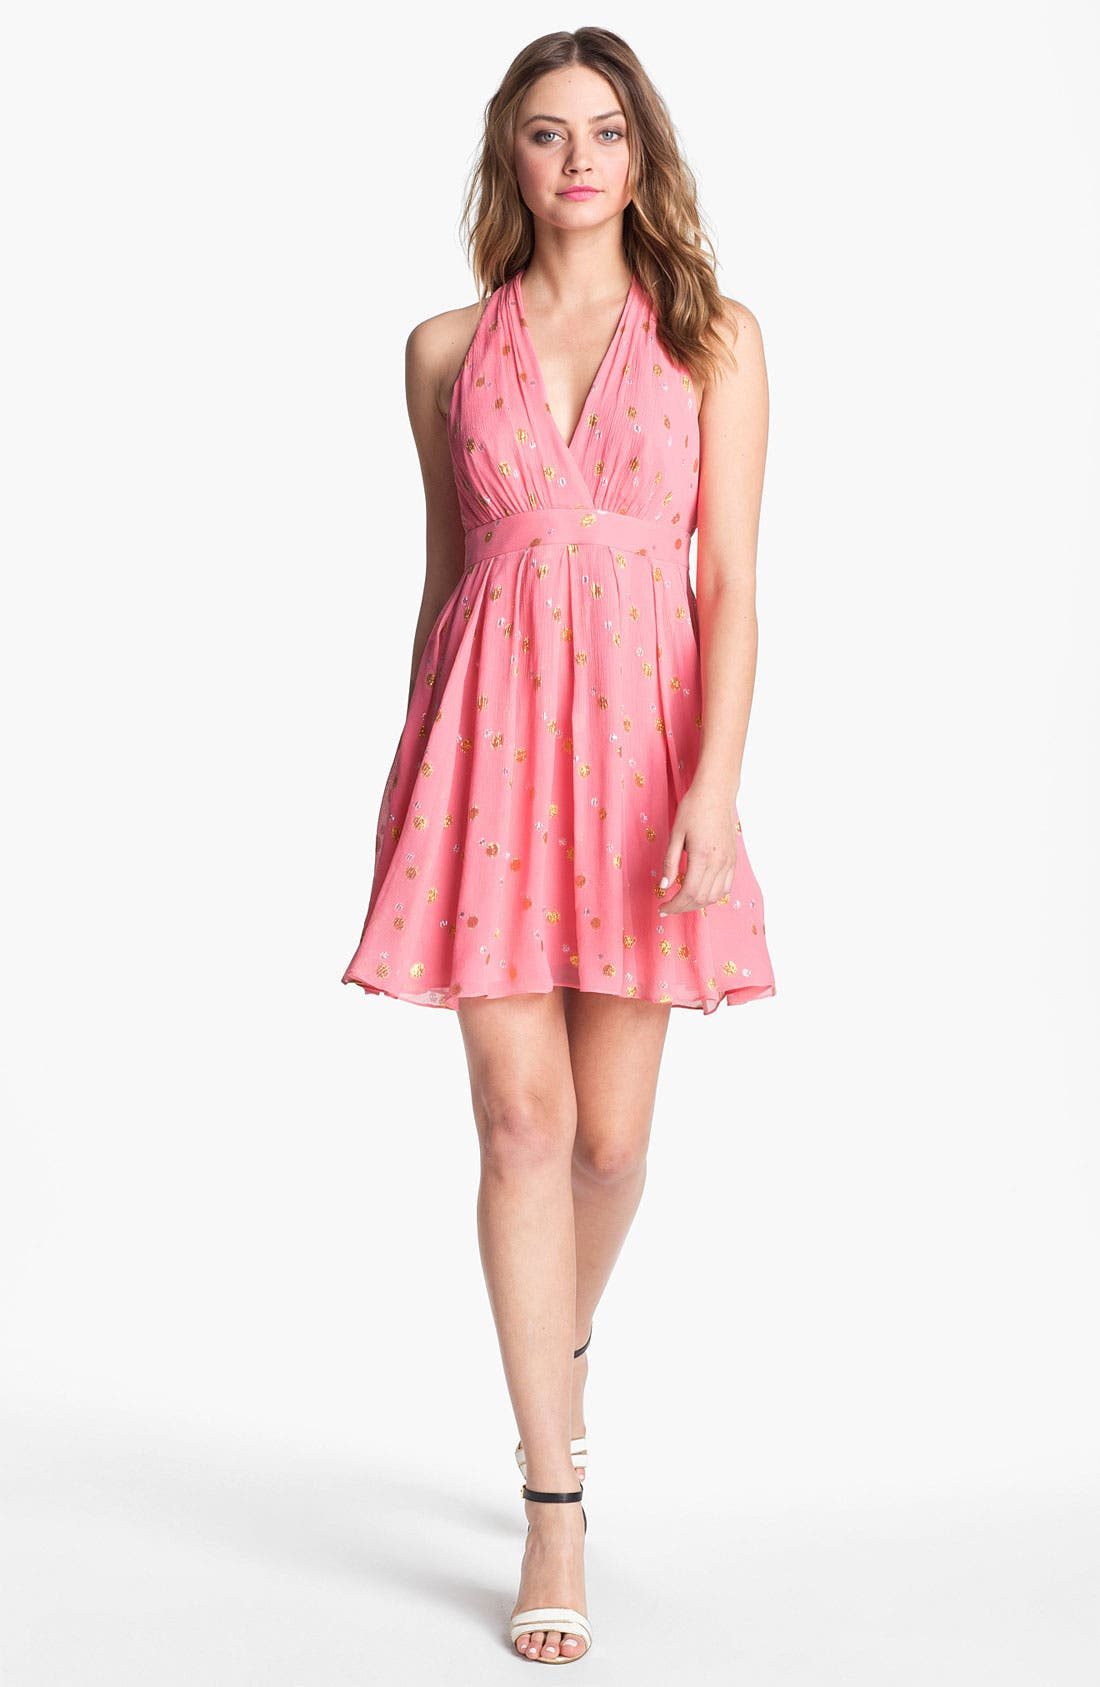 Alternate Image 1  - Nicole Miller 'Mara' Metallic Crinkled Fit & flare Dress